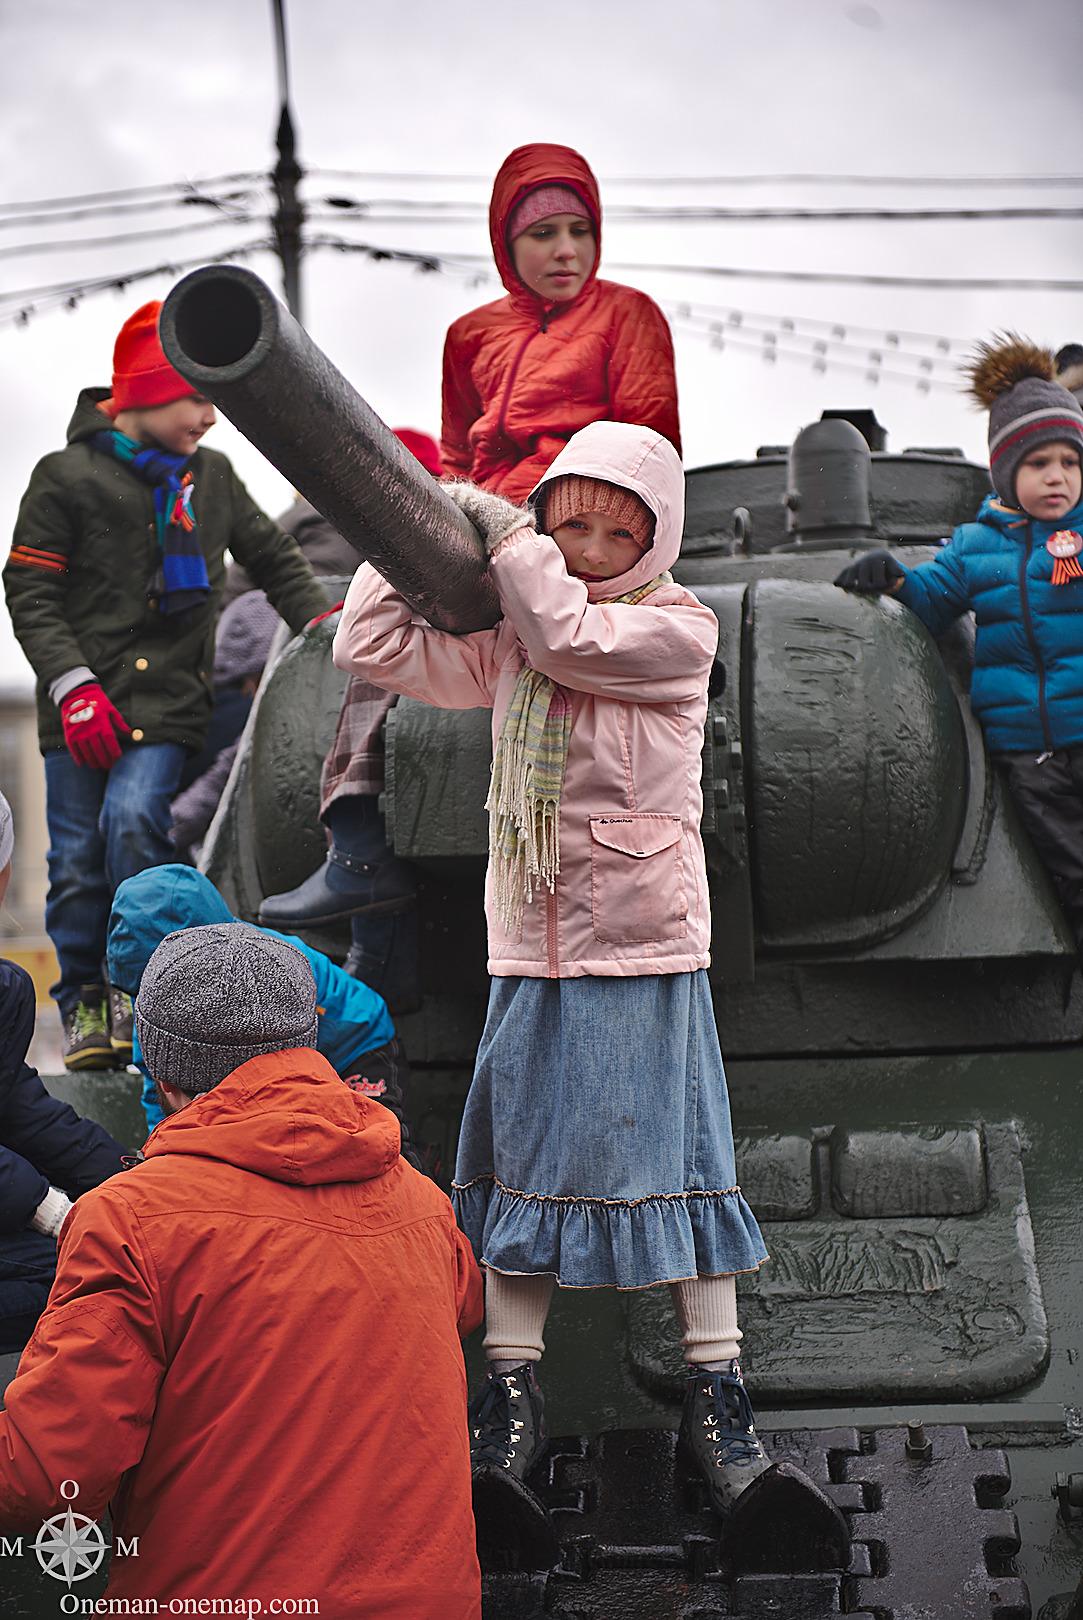 russland tag des sieges